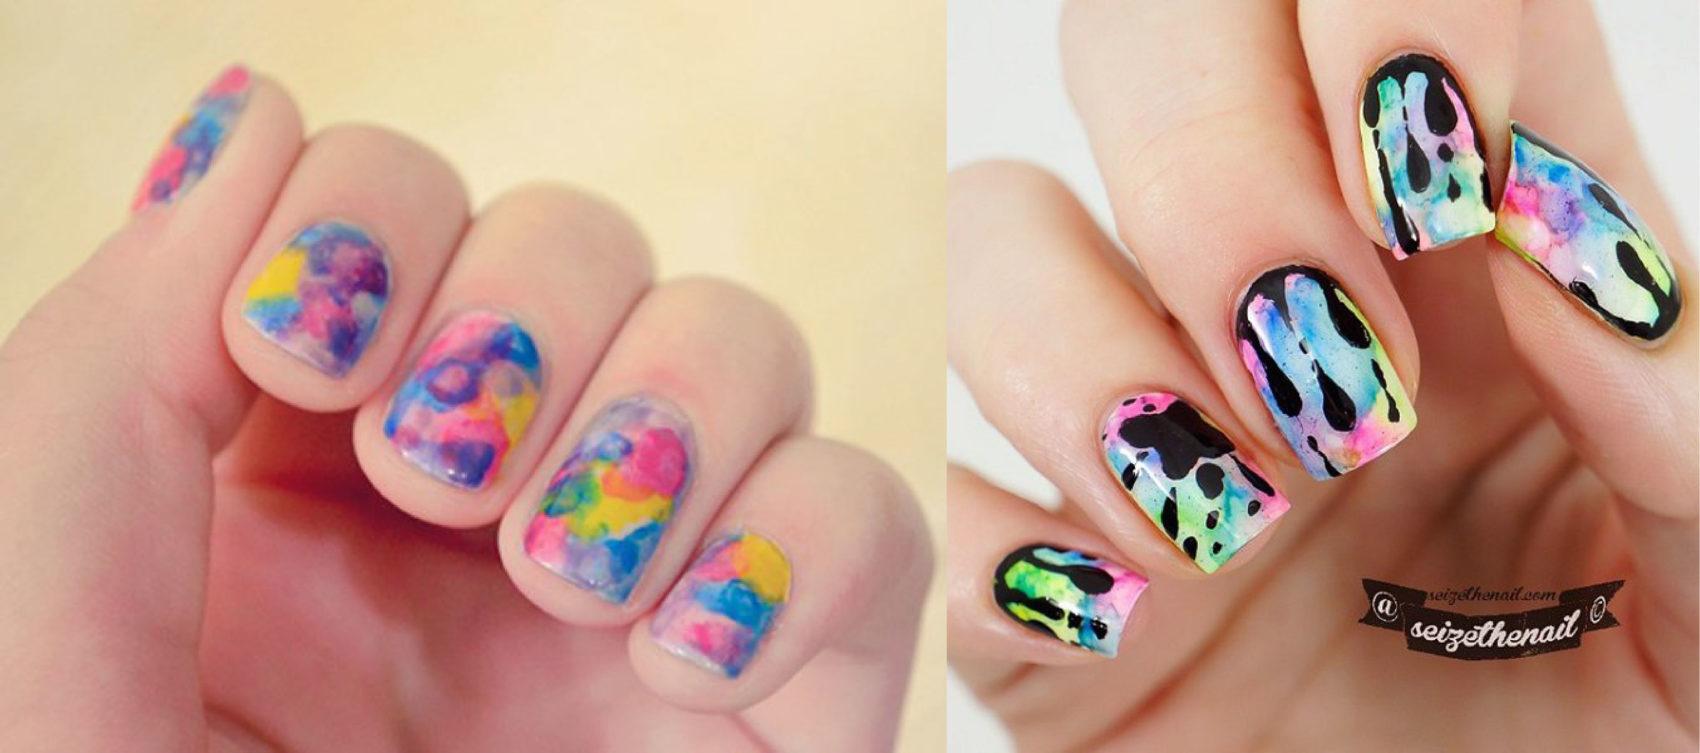 Pretty Watercolor Nail Art Ideas | 99inspiration